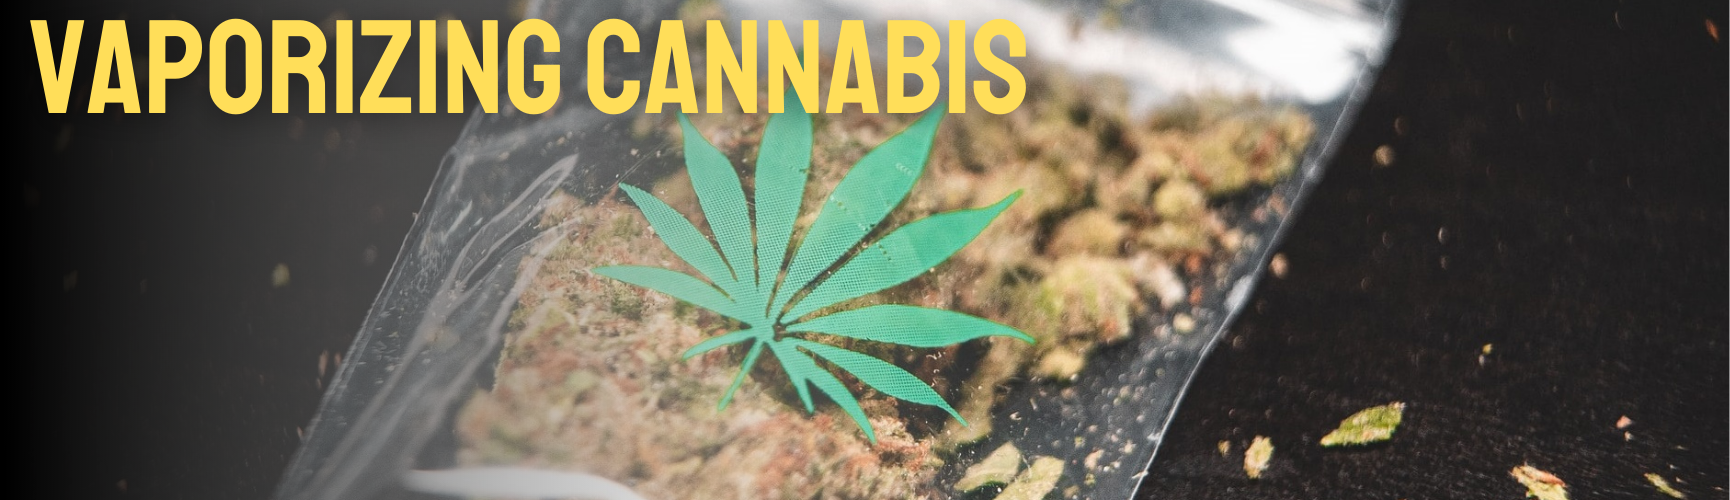 Vaporizing Cannabis